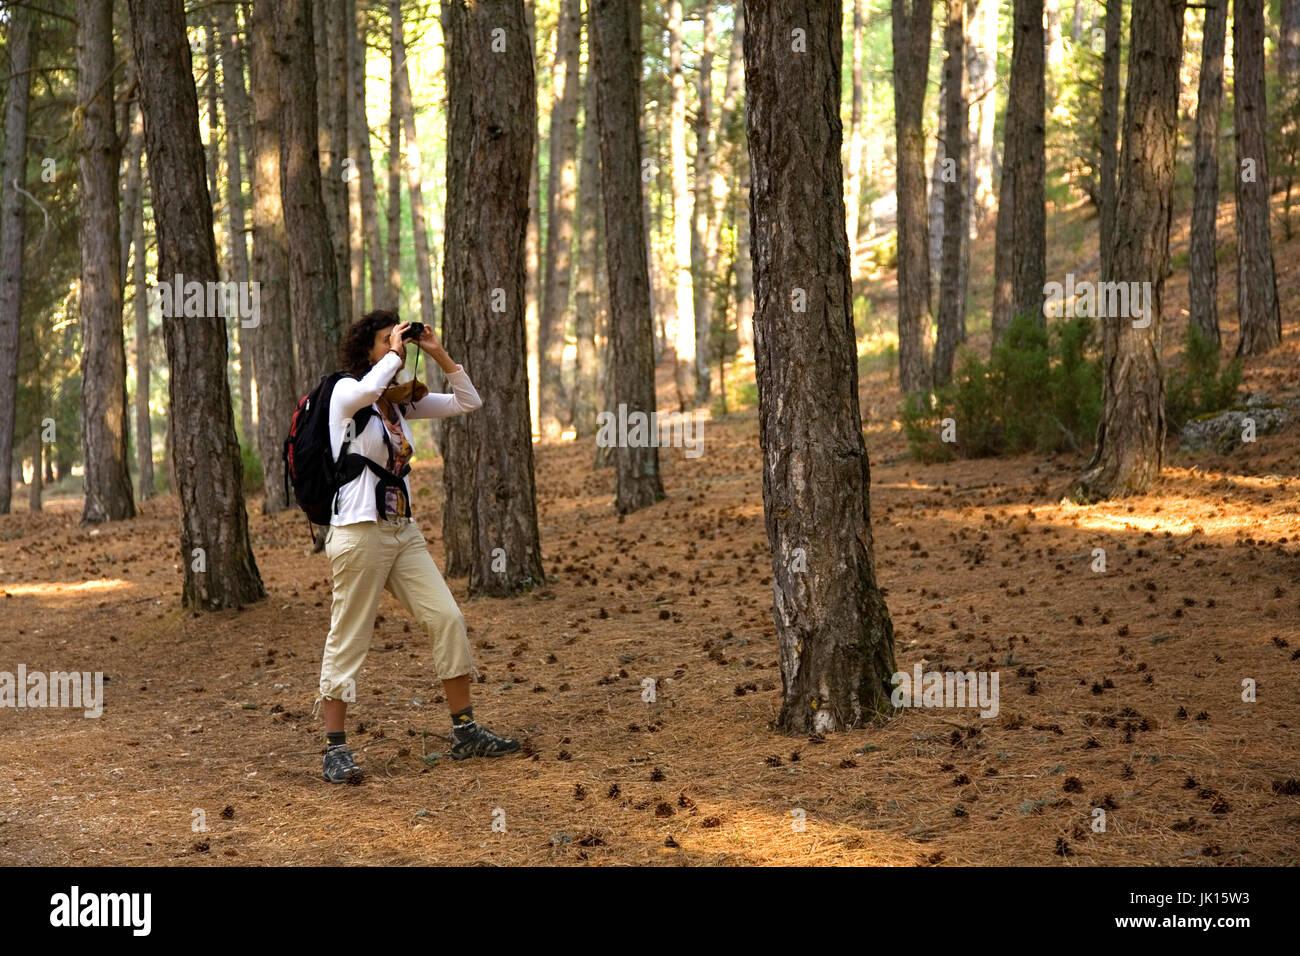 Woman in a forest. Cañon del  Rio Lobos  Natural Park .  Soria province, Castilla y Leon, Spain, Europe. - Stock Image